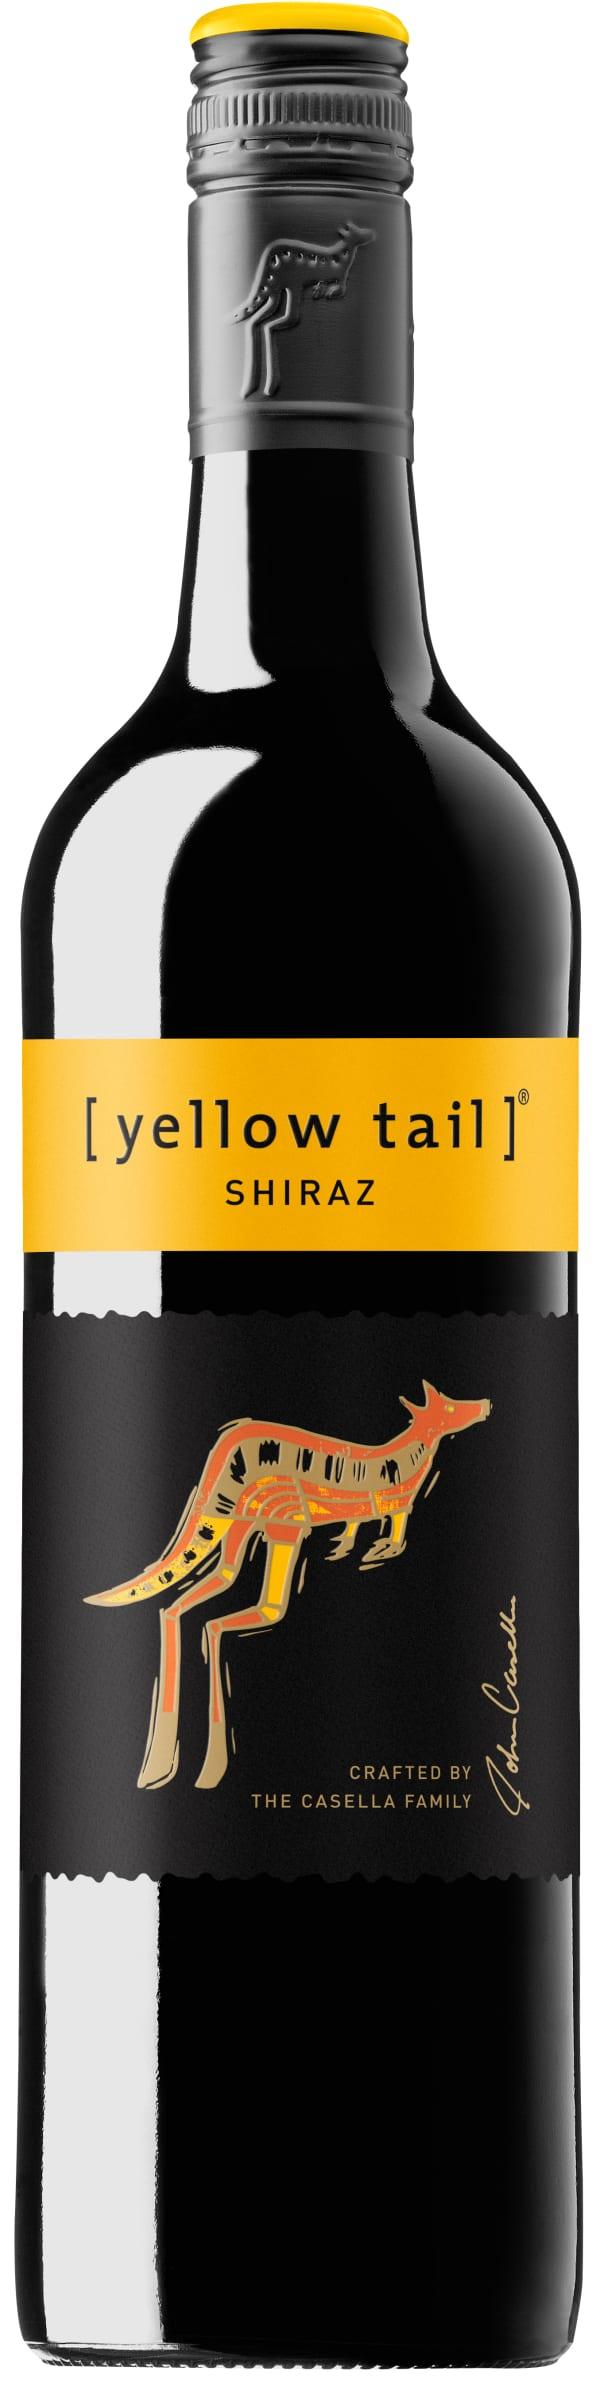 Yellow Tail Shiraz 2017